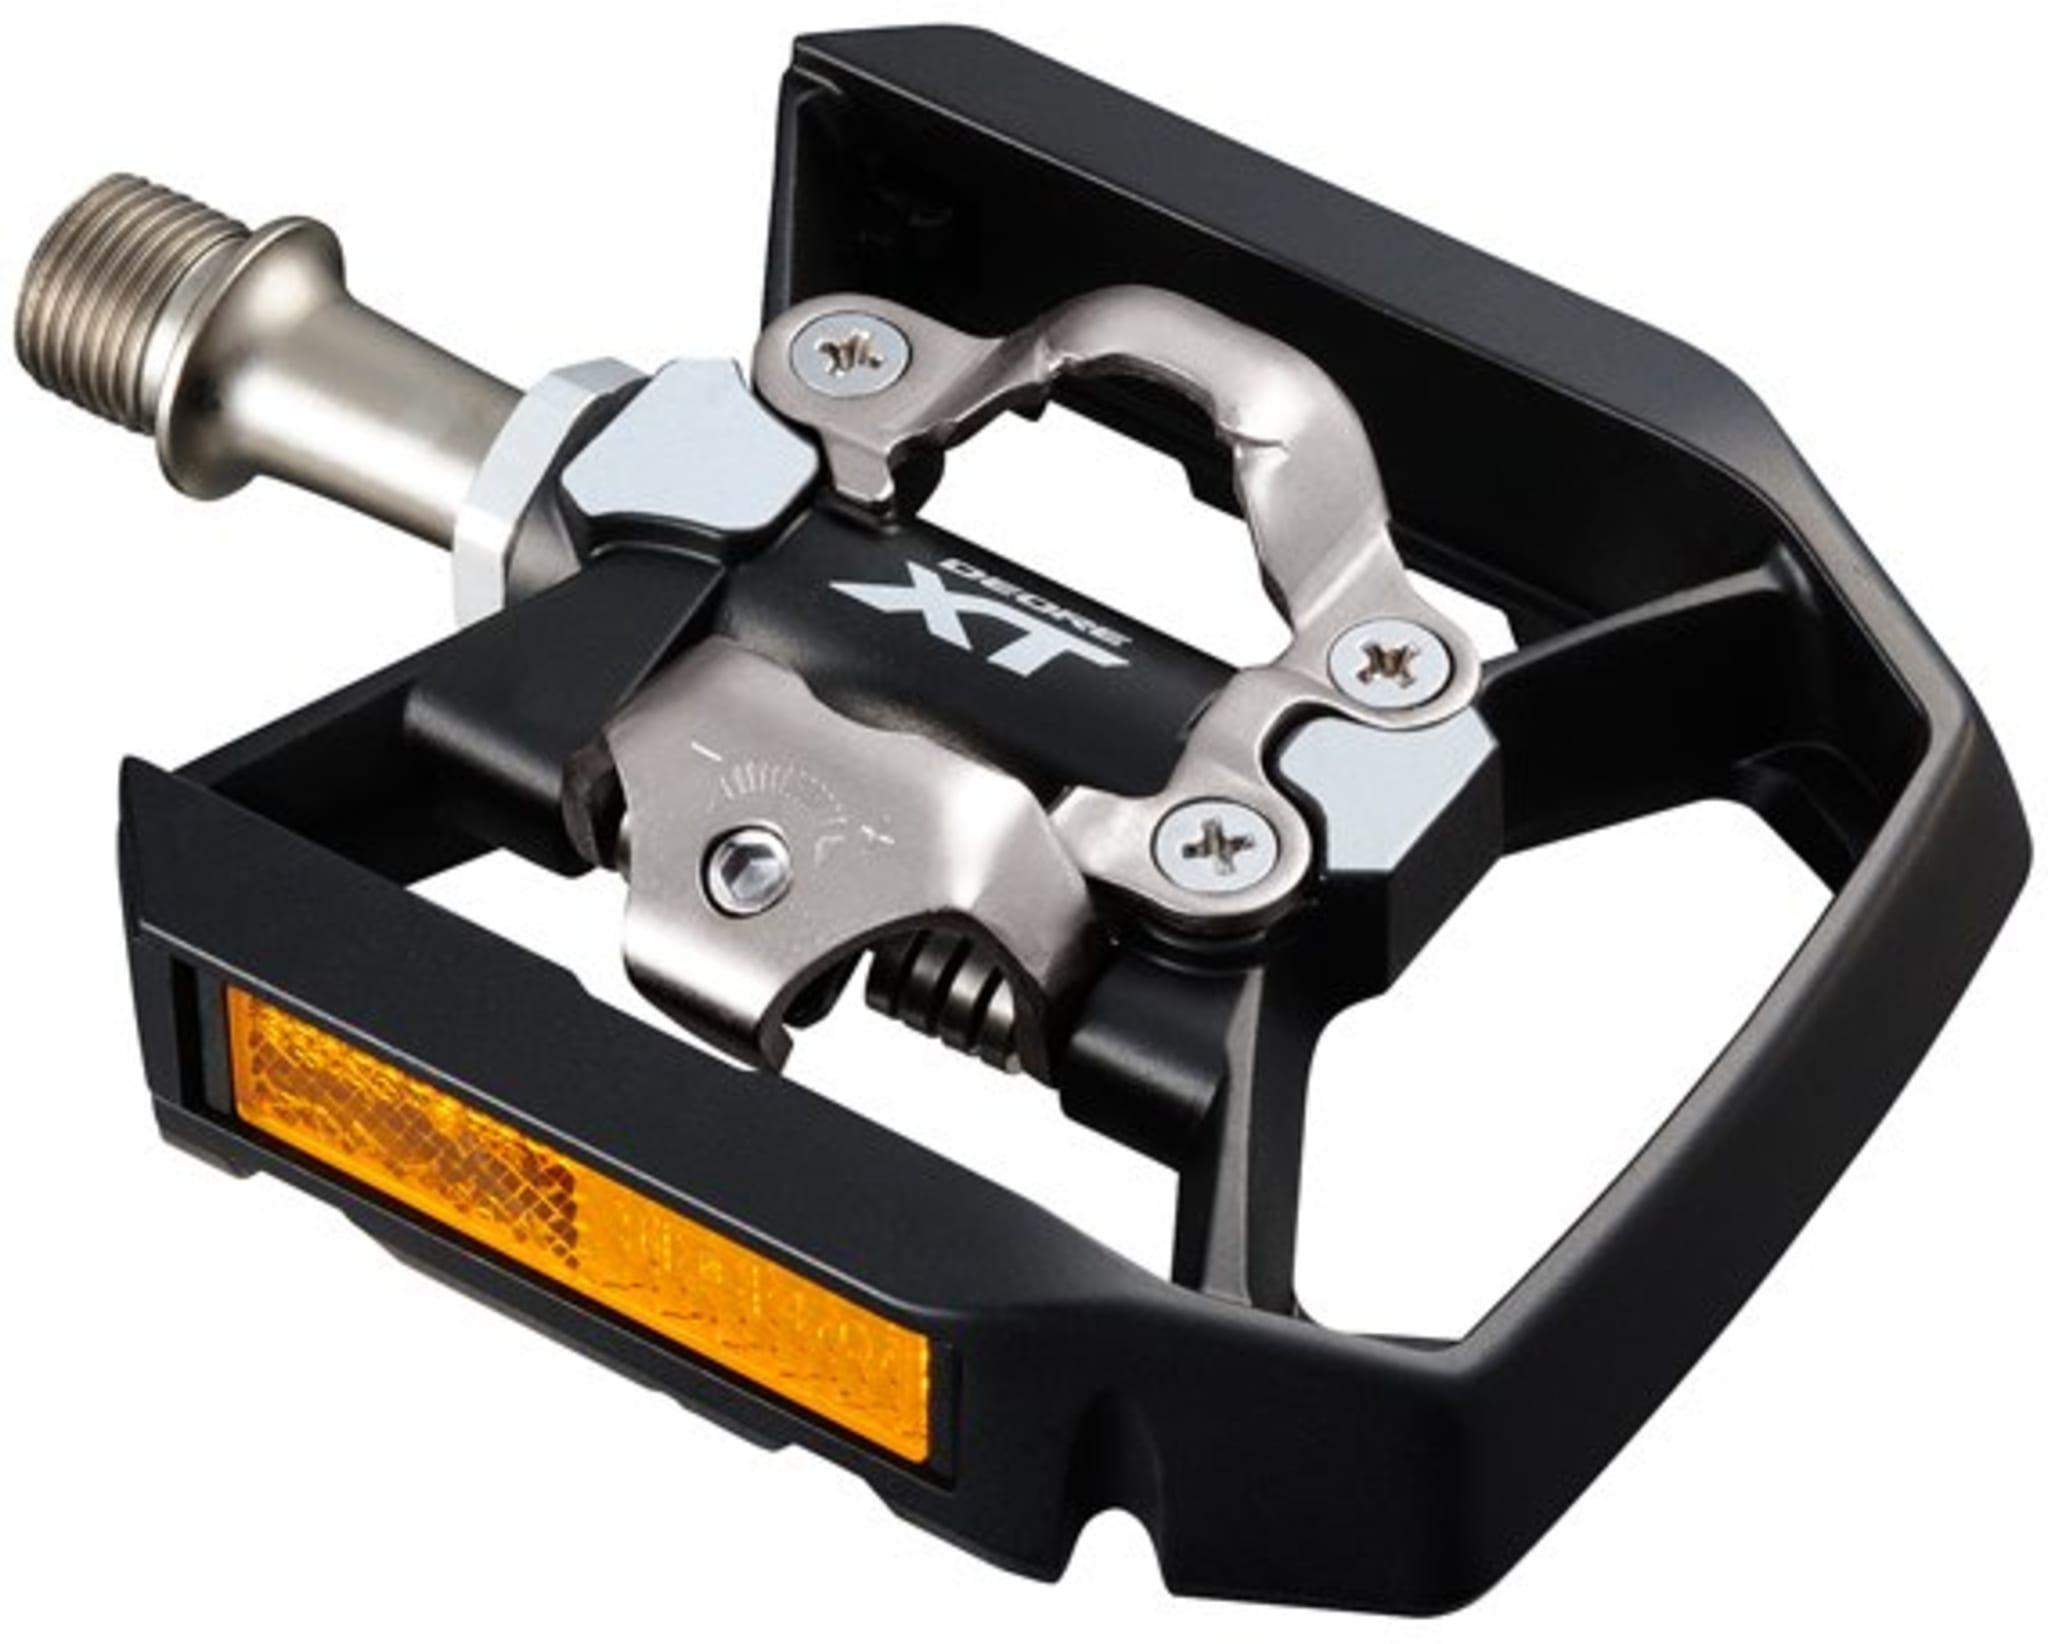 XT Combo Pedal SPD PD-T8000